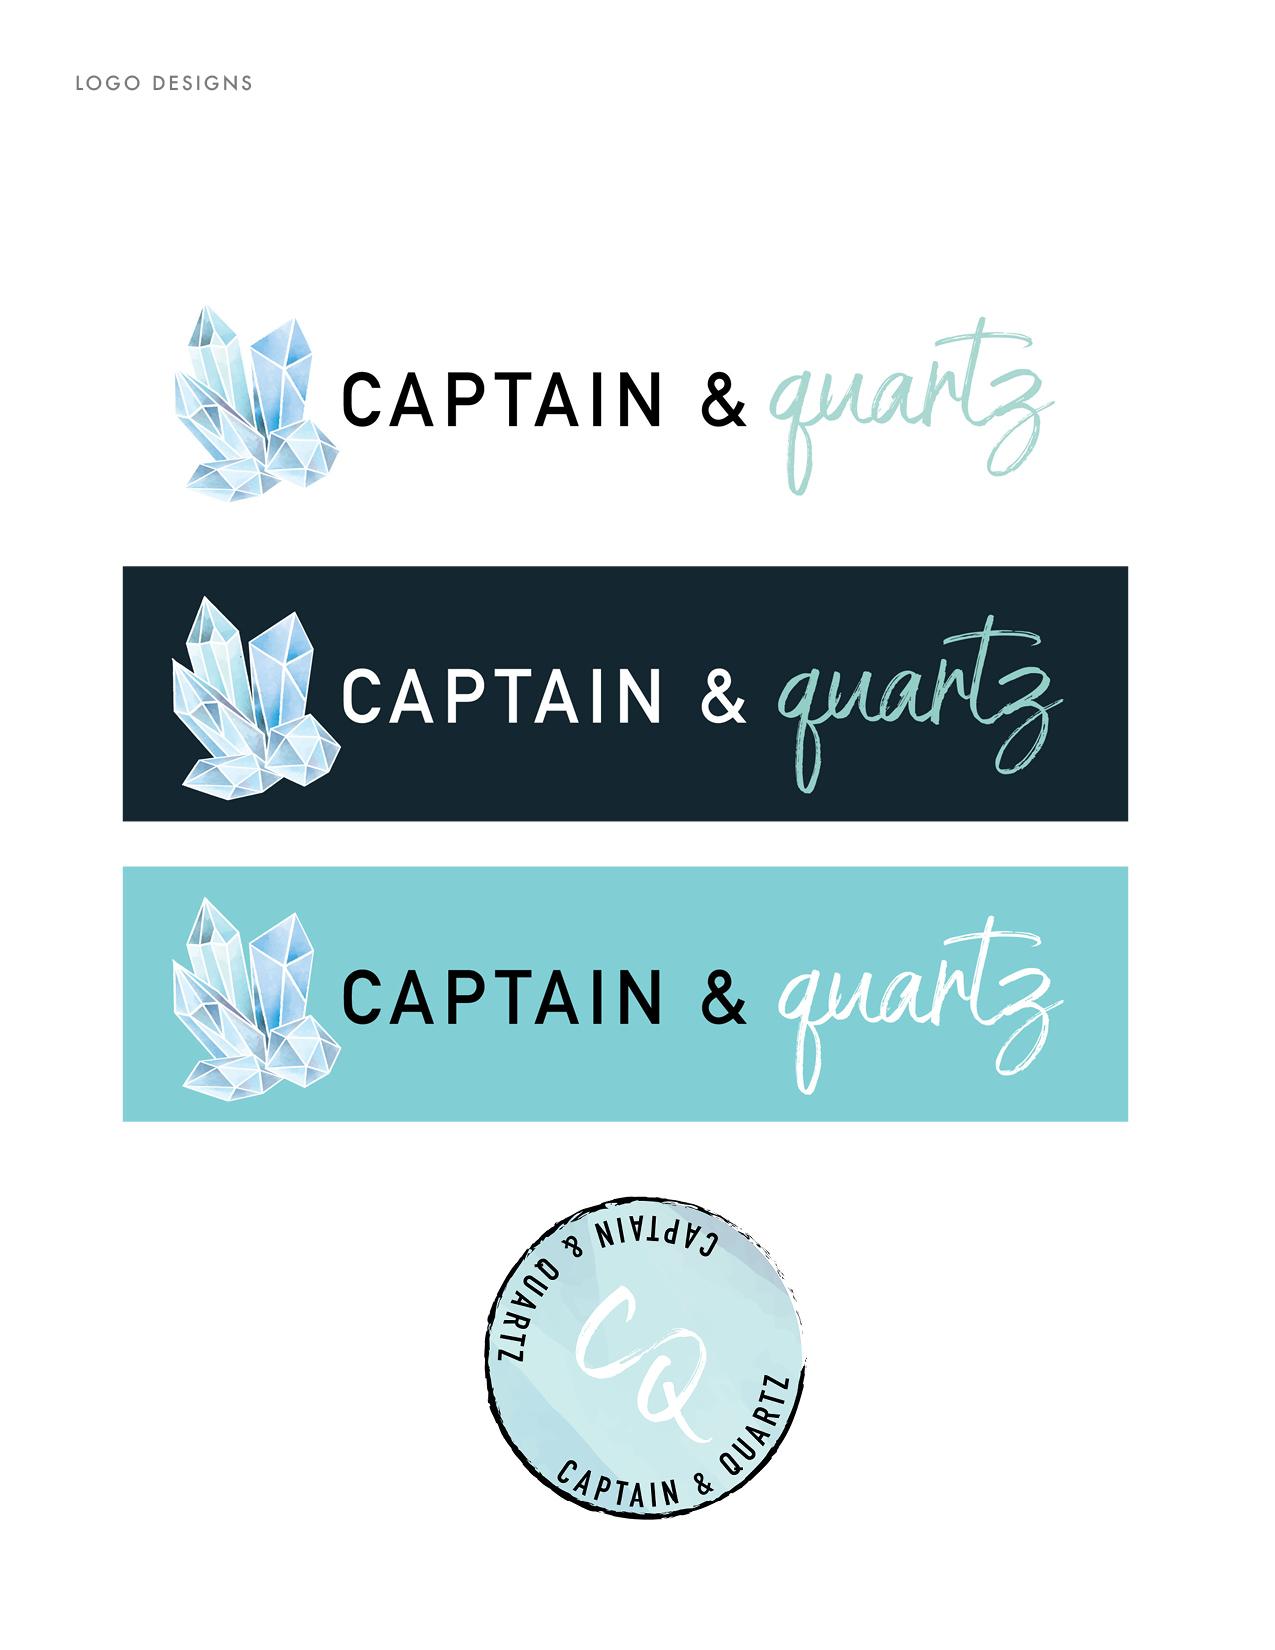 CaptainandQuartz_Logos2_Presentation.jpg